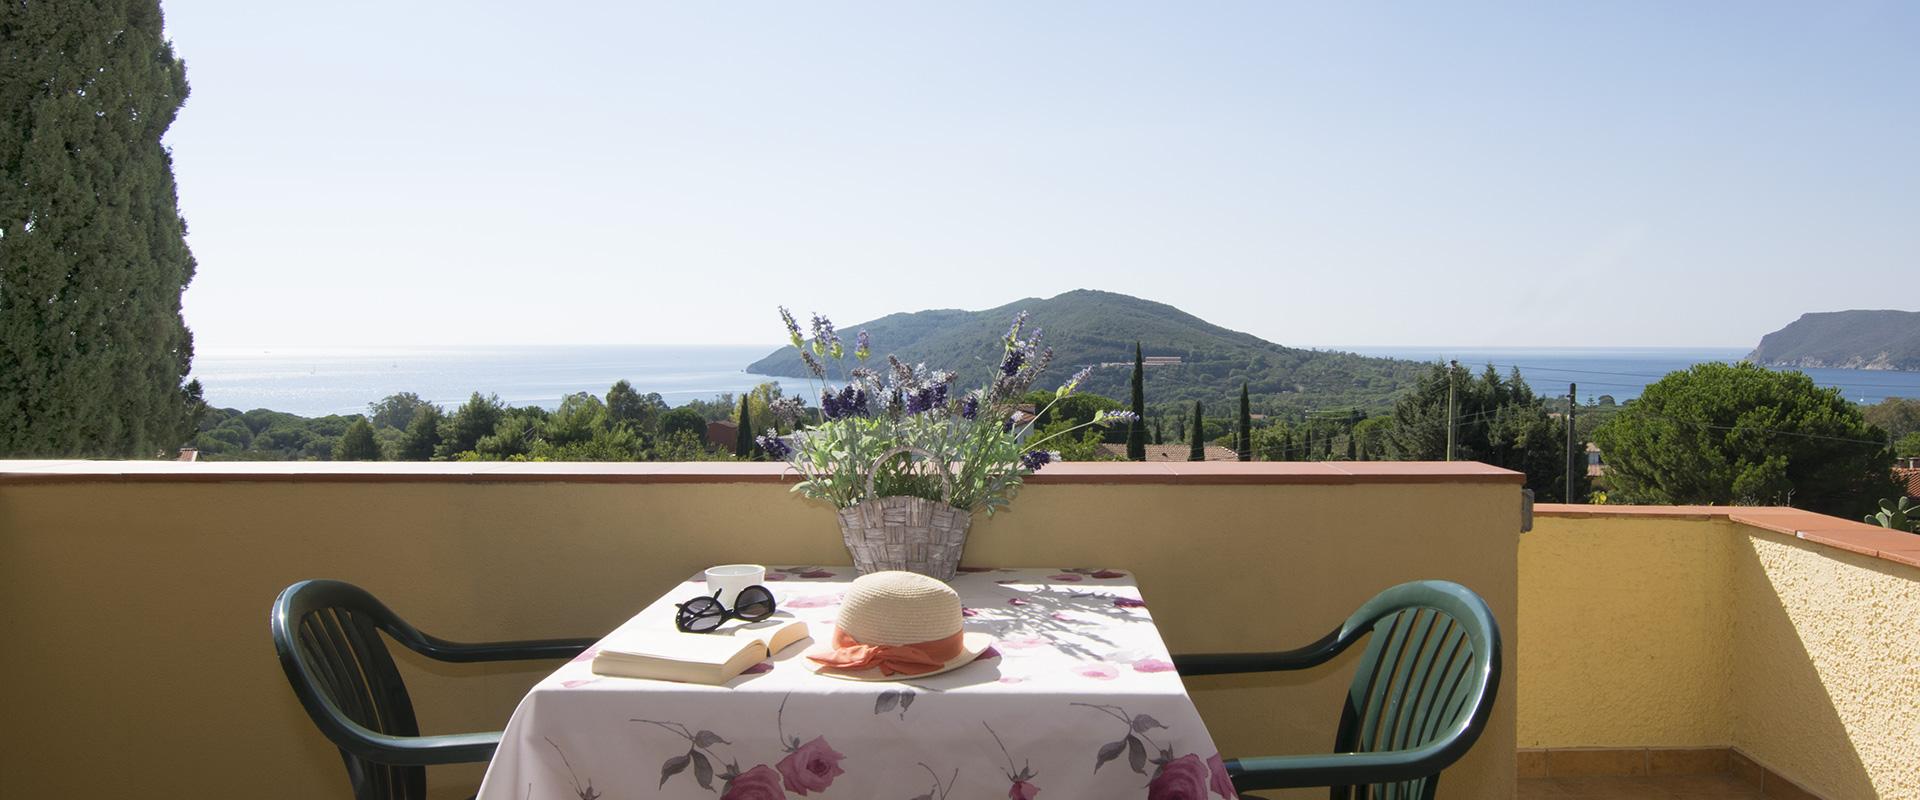 Mini Hotel Lacona